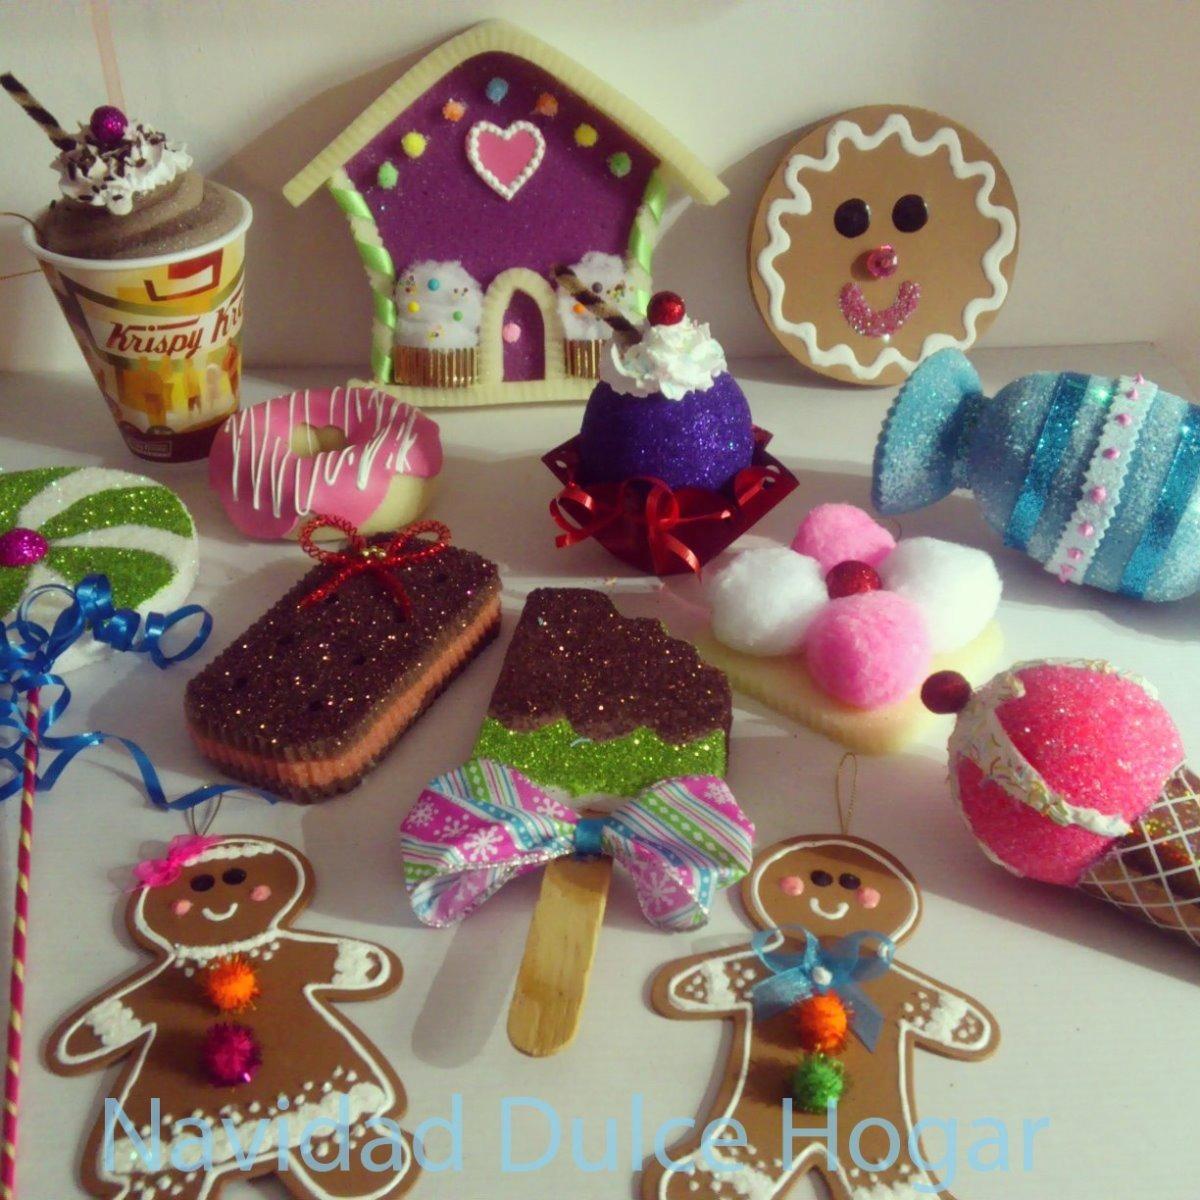 Adornos navide os de dulces para arbol d navidad dulce for Buscar adornos de navidad